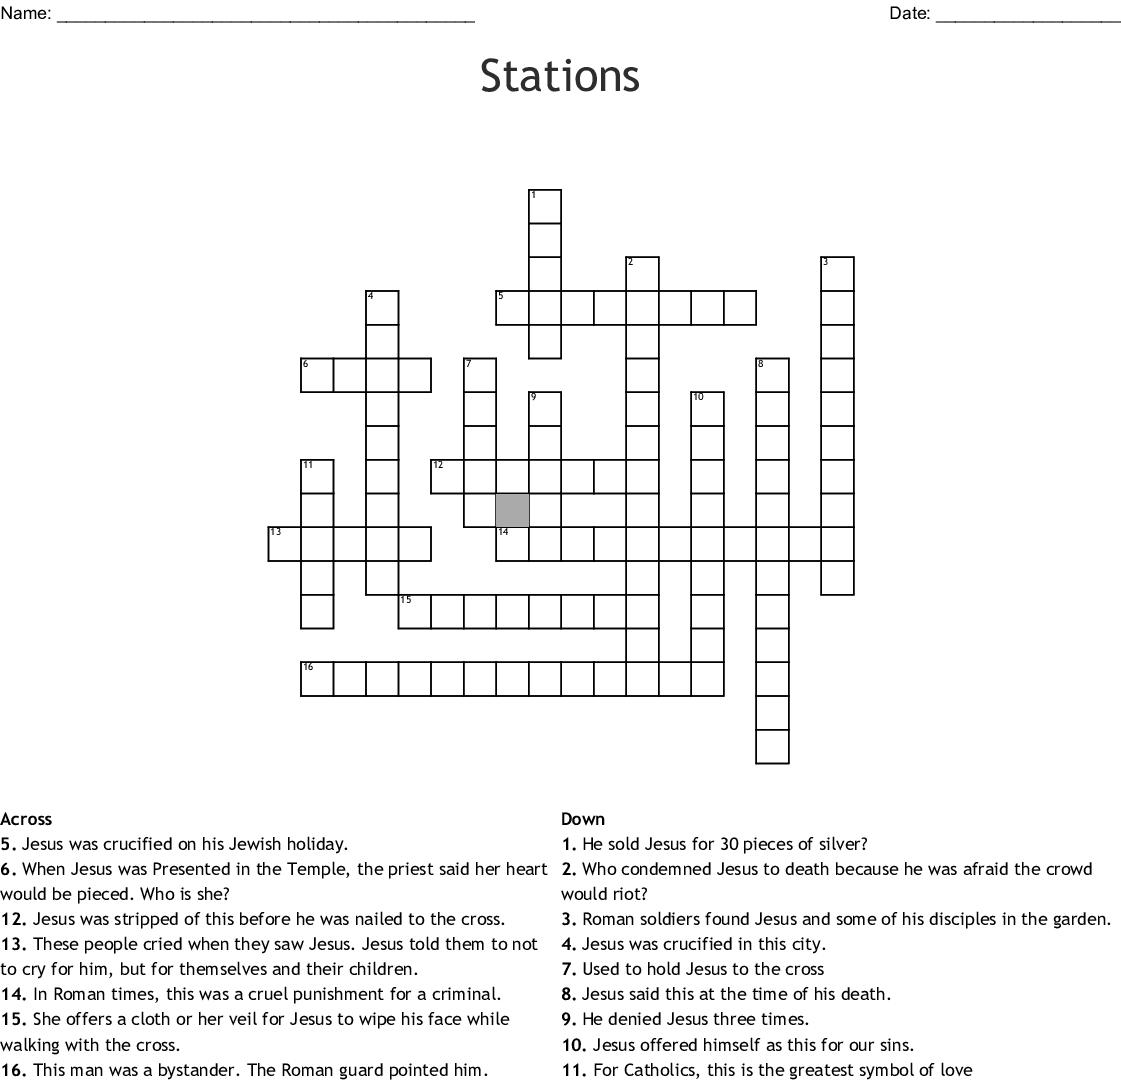 Stations Crossword